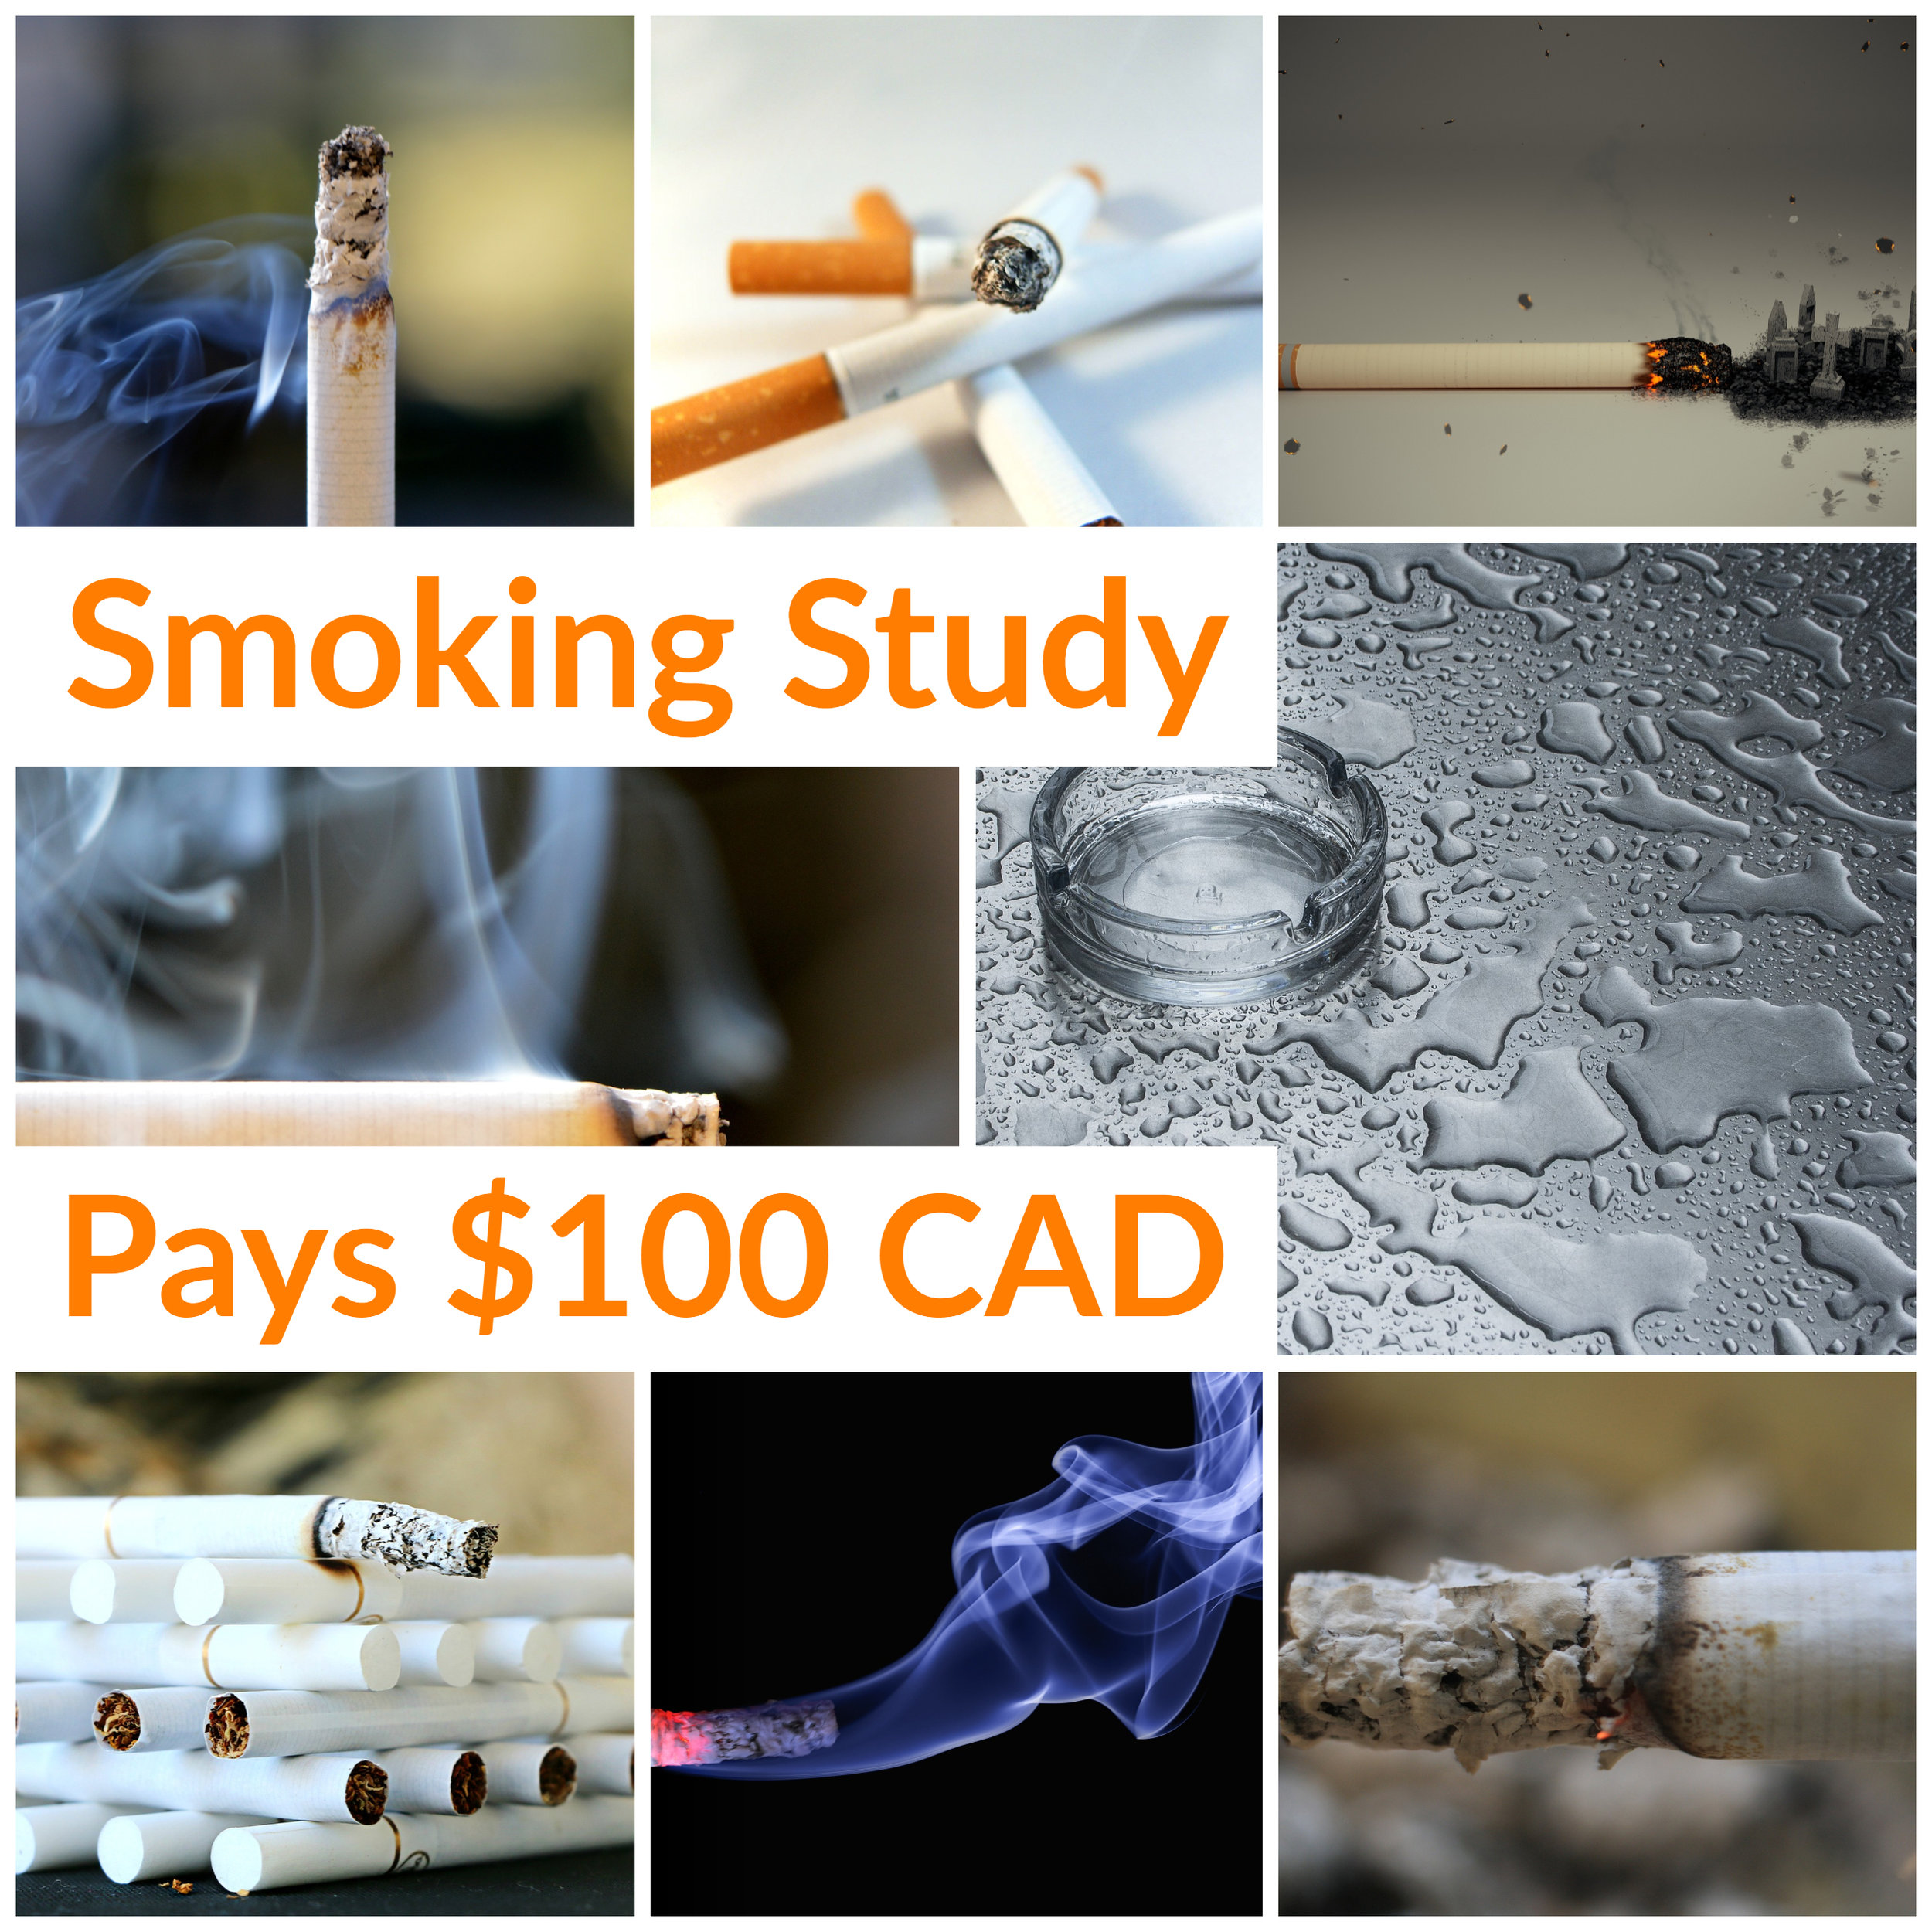 Gold & Gold - Smoking Study (1).jpg